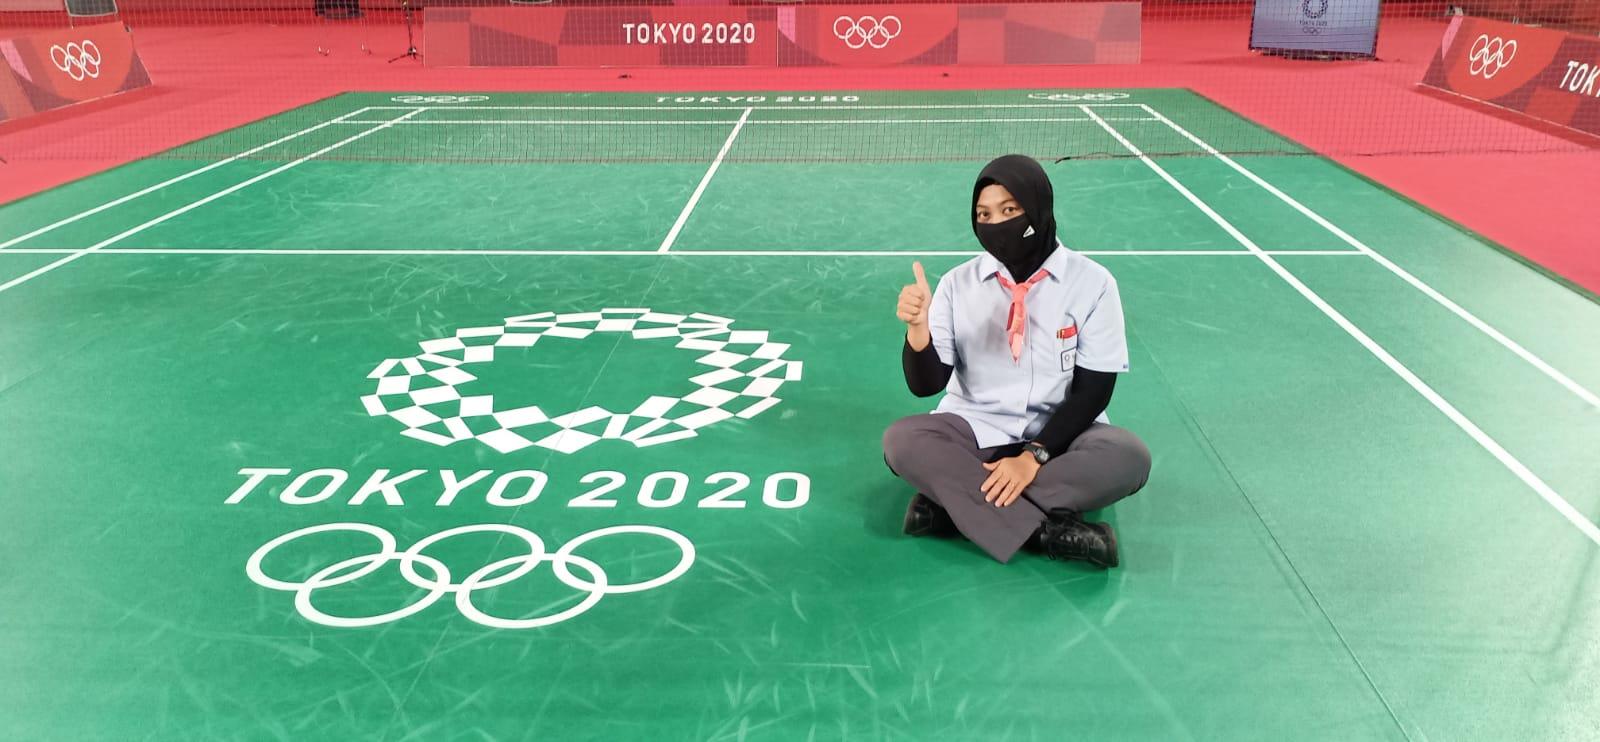 Kenalan Sama Guru Bahasa Inggris yang Jadi Wasil Olympic 2020